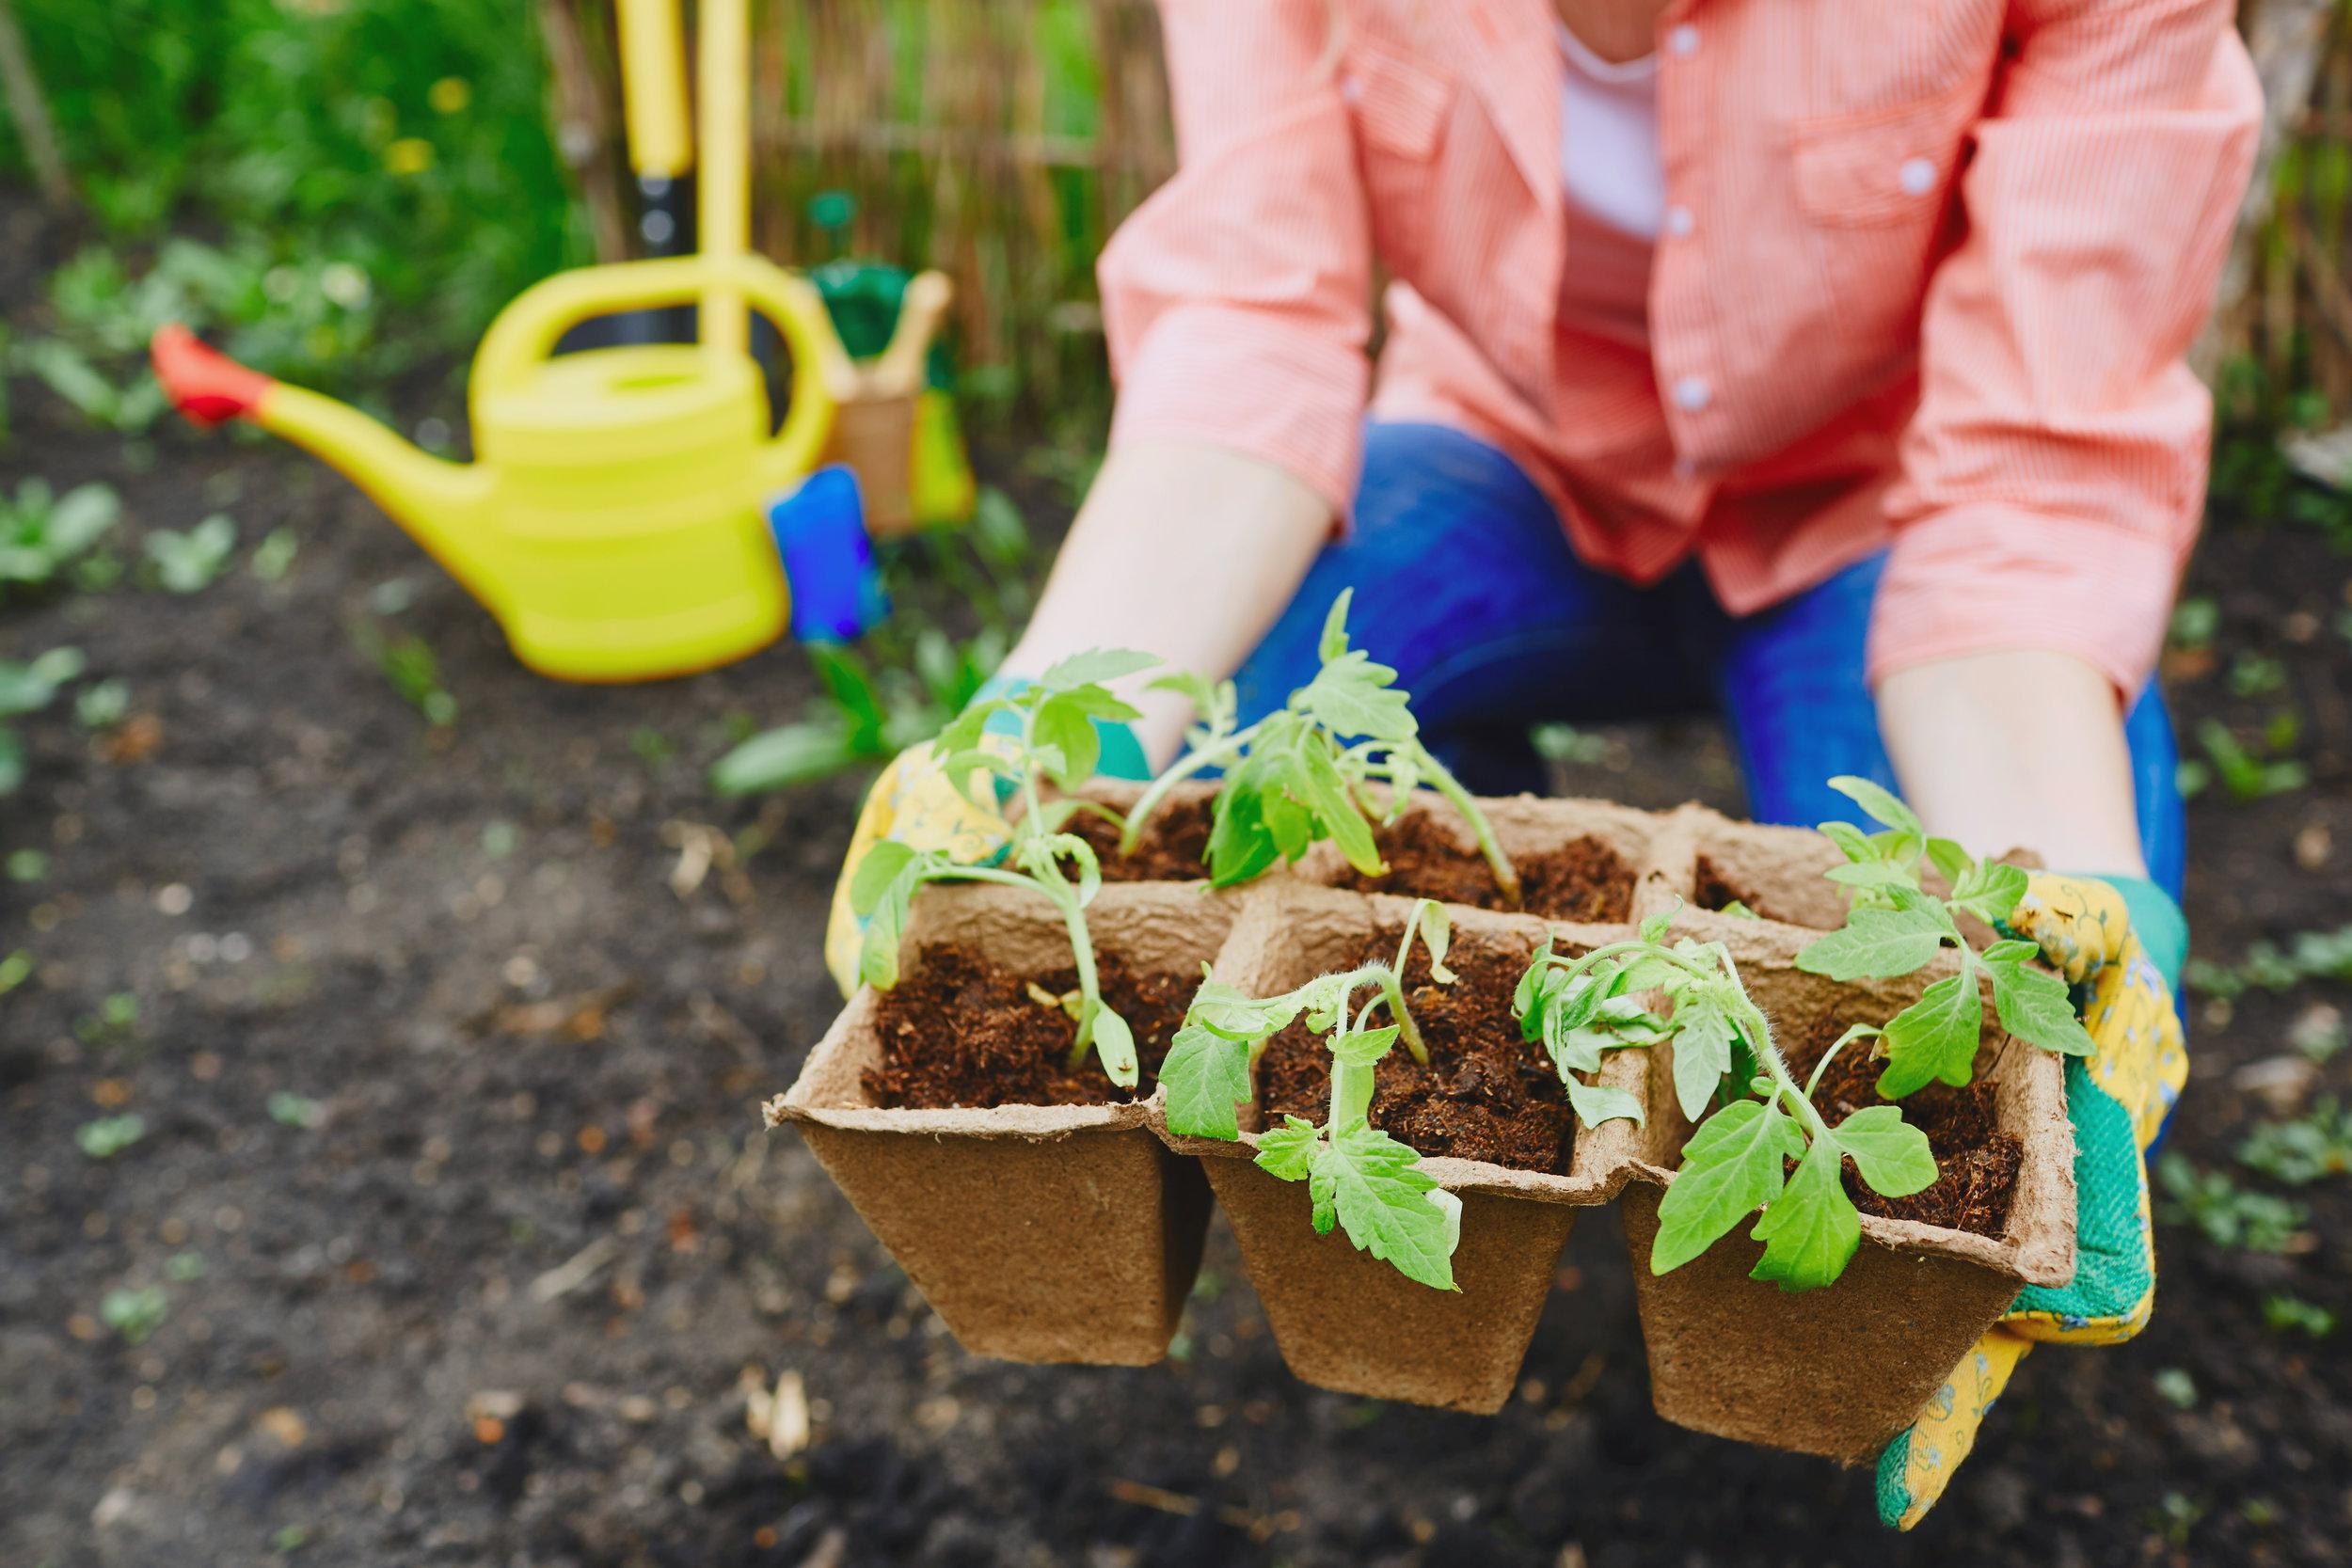 tomato-sprouts-in-peat-pots-P88WQ4V.jpg